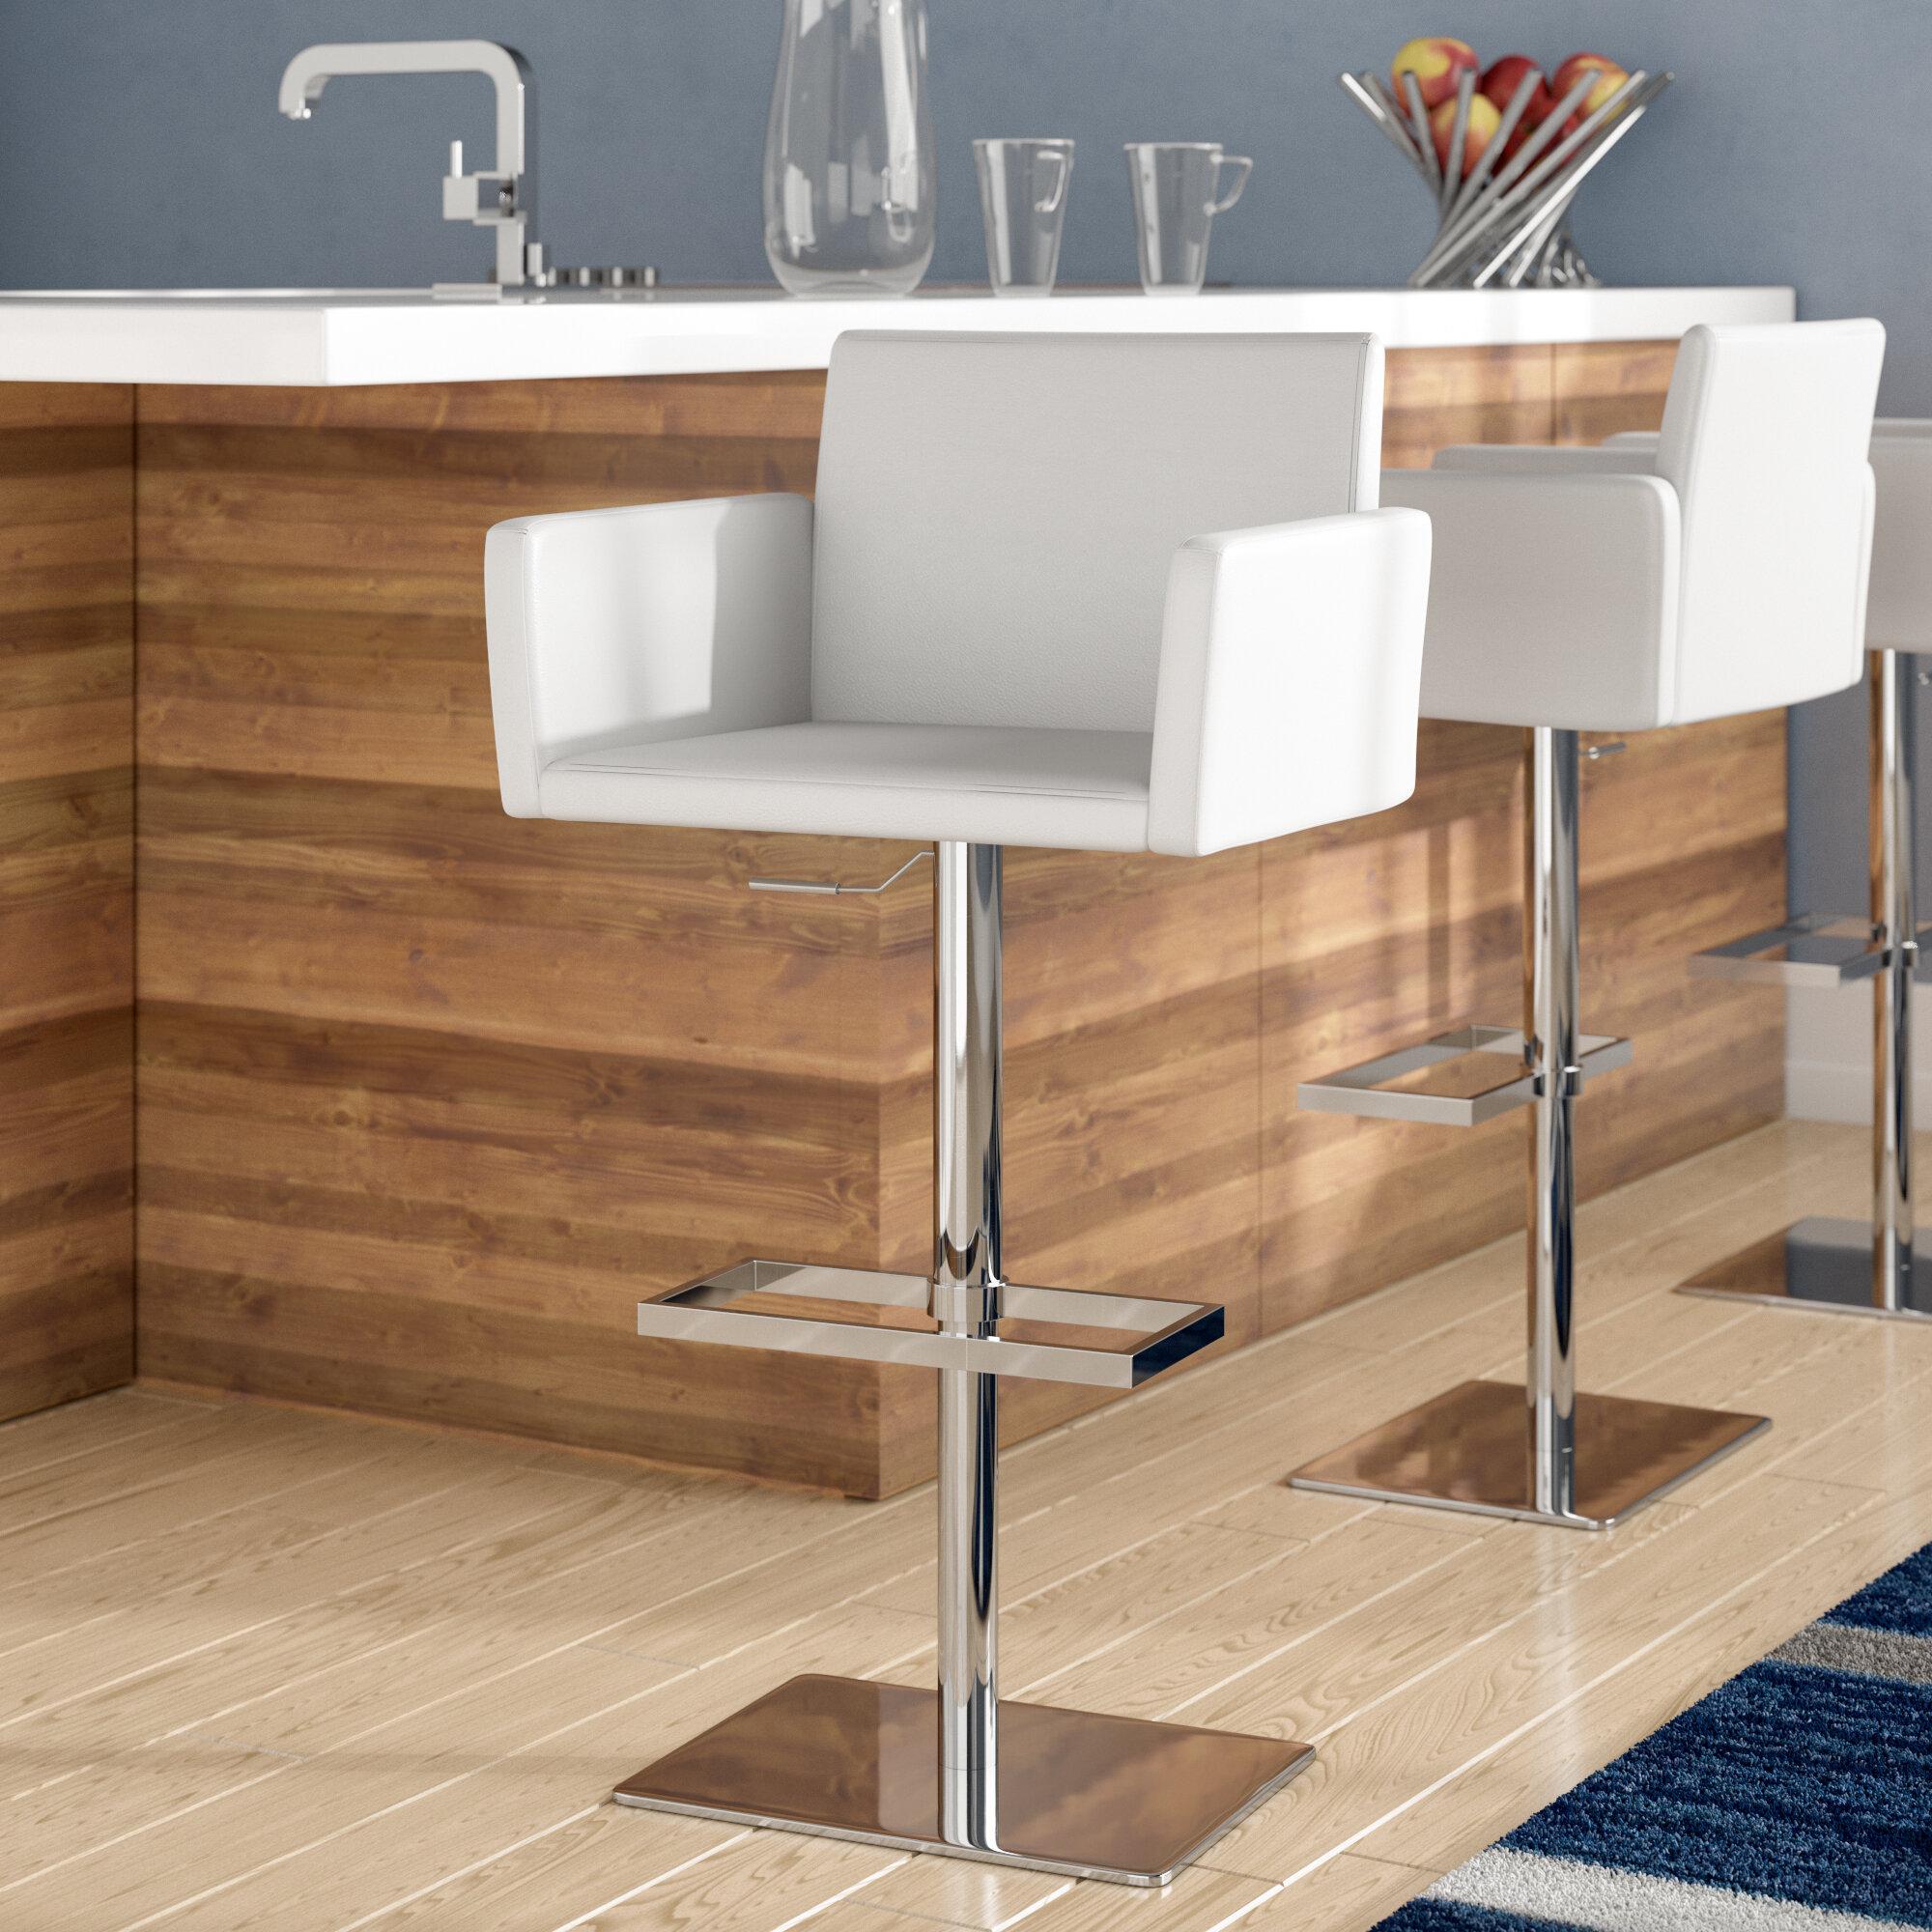 Awe Inspiring Tuller Adjustable Height Swivel Bar Stool Cjindustries Chair Design For Home Cjindustriesco